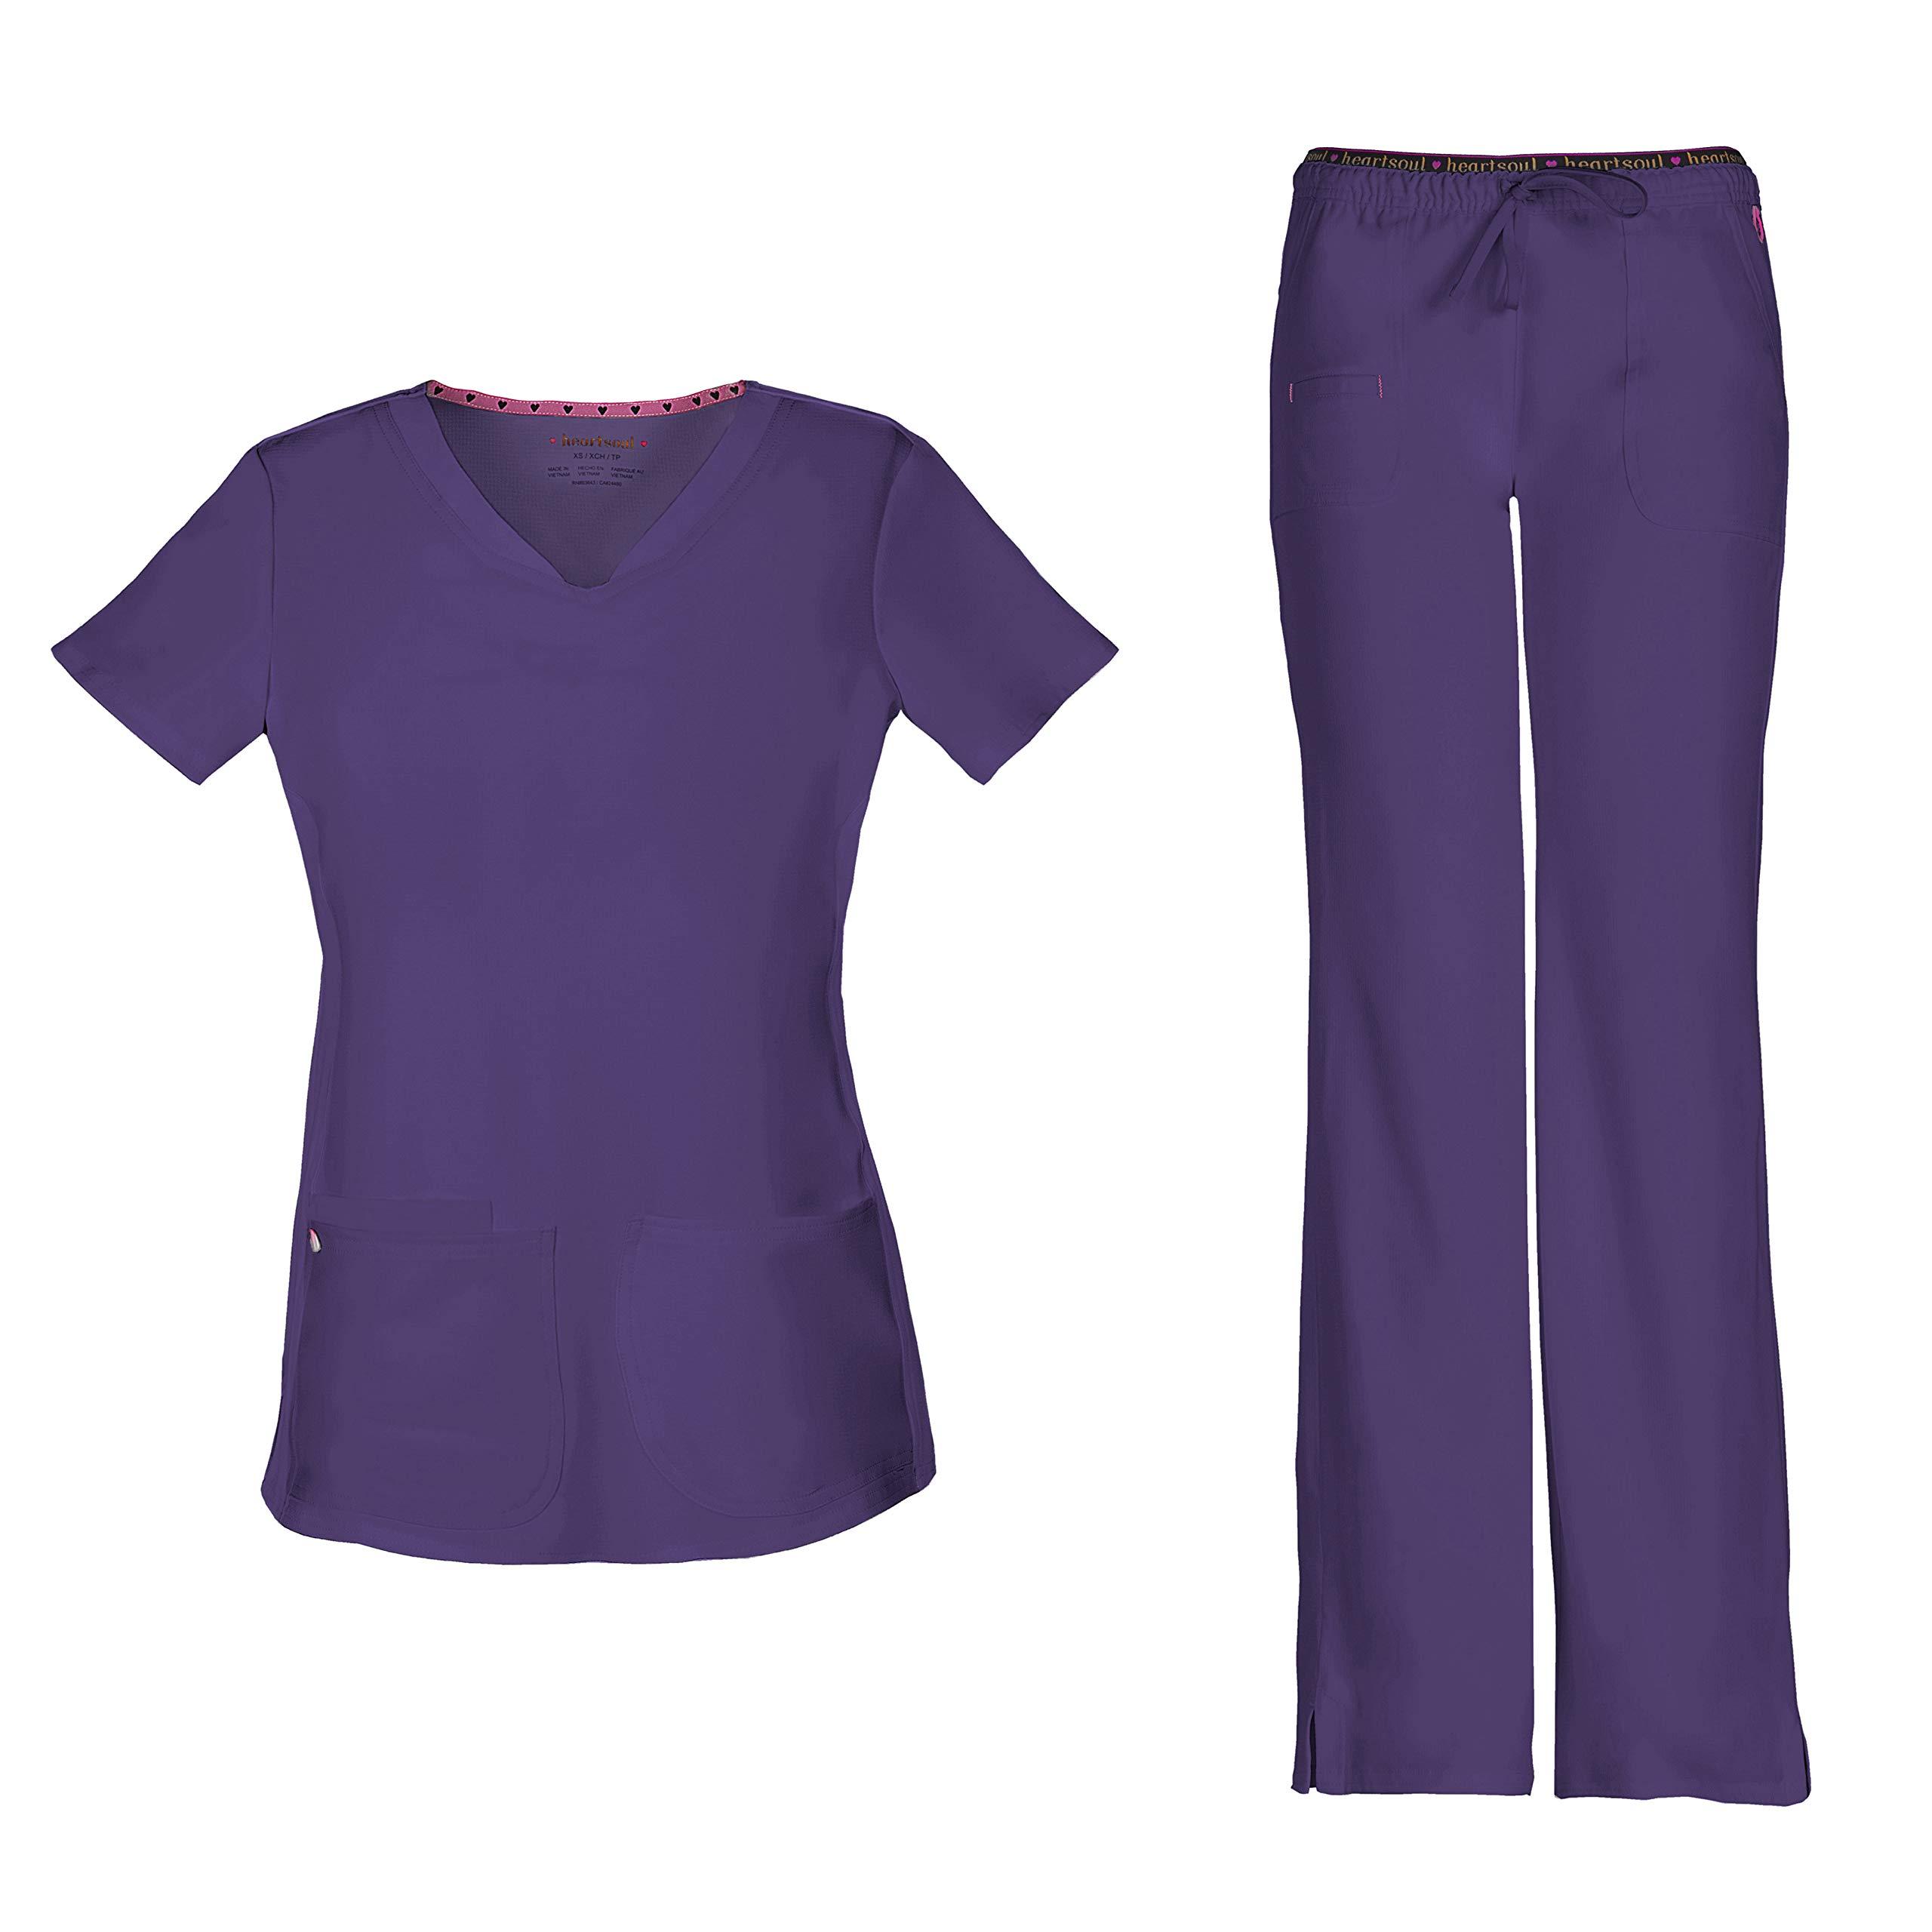 HeartSoul Women's Pitter-Pat Shaped V-Neck Scrub Top 20710 & Heartbreaker Heart Soul Drawstring Scrub Pants 20110 Medical Scrub Set (Grape - XX-Large/XXX-Large)